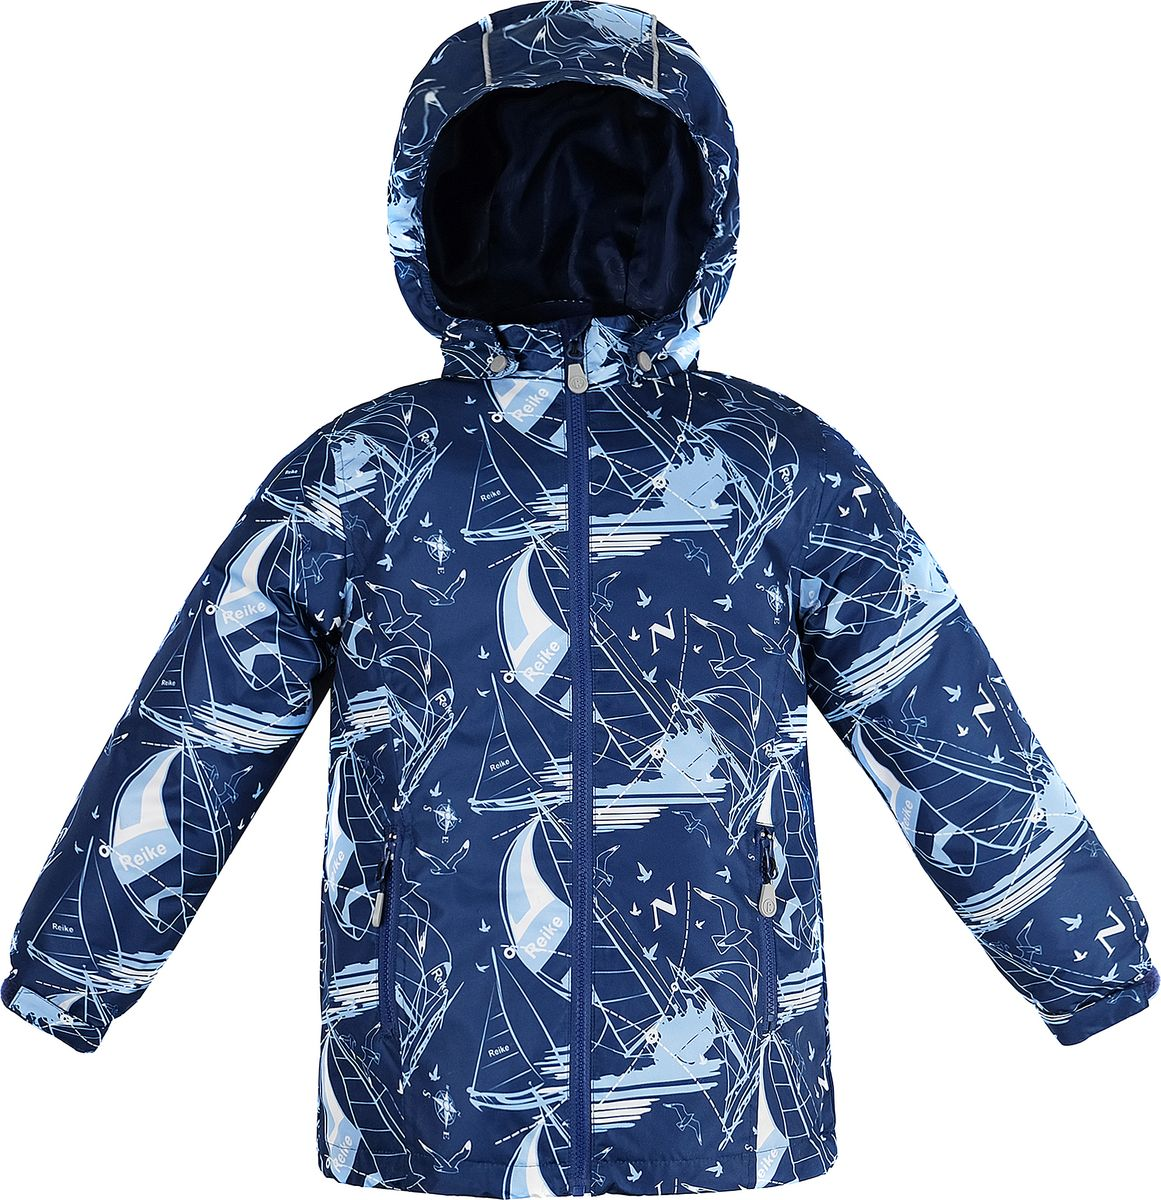 Куртка для мальчика Reike, цвет: темно-синий. 40 900 115_YAHT(FL) navy. Размер 134, 9 лет40 900 115_YAHT(FL) navy